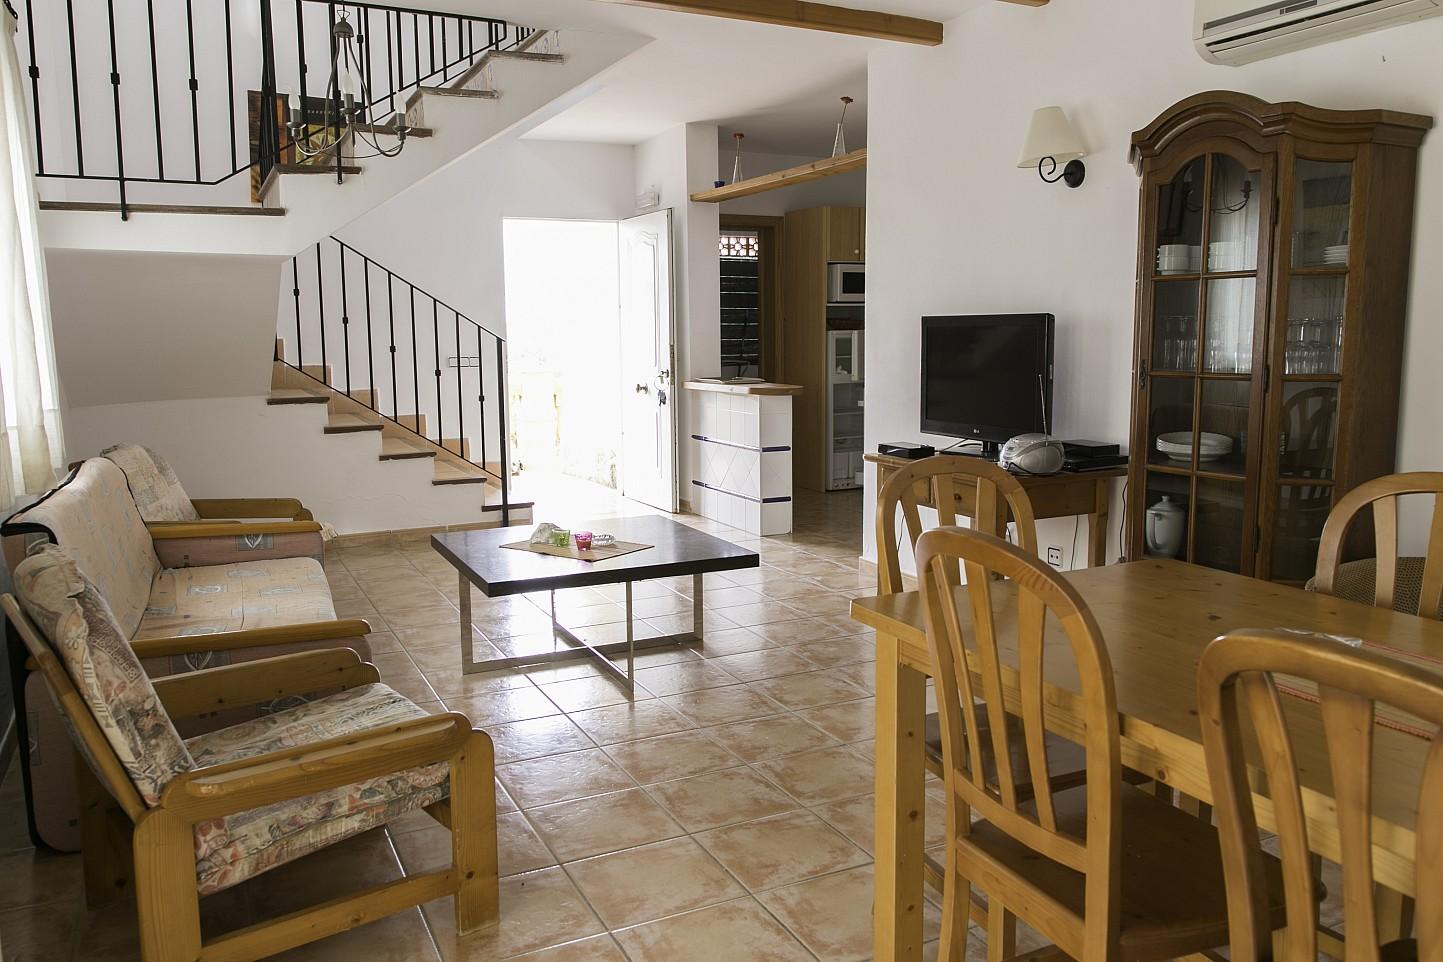 Salón-comedor de bonita casa en venta en Urb. Villas de Cala Romántica en Mallorca